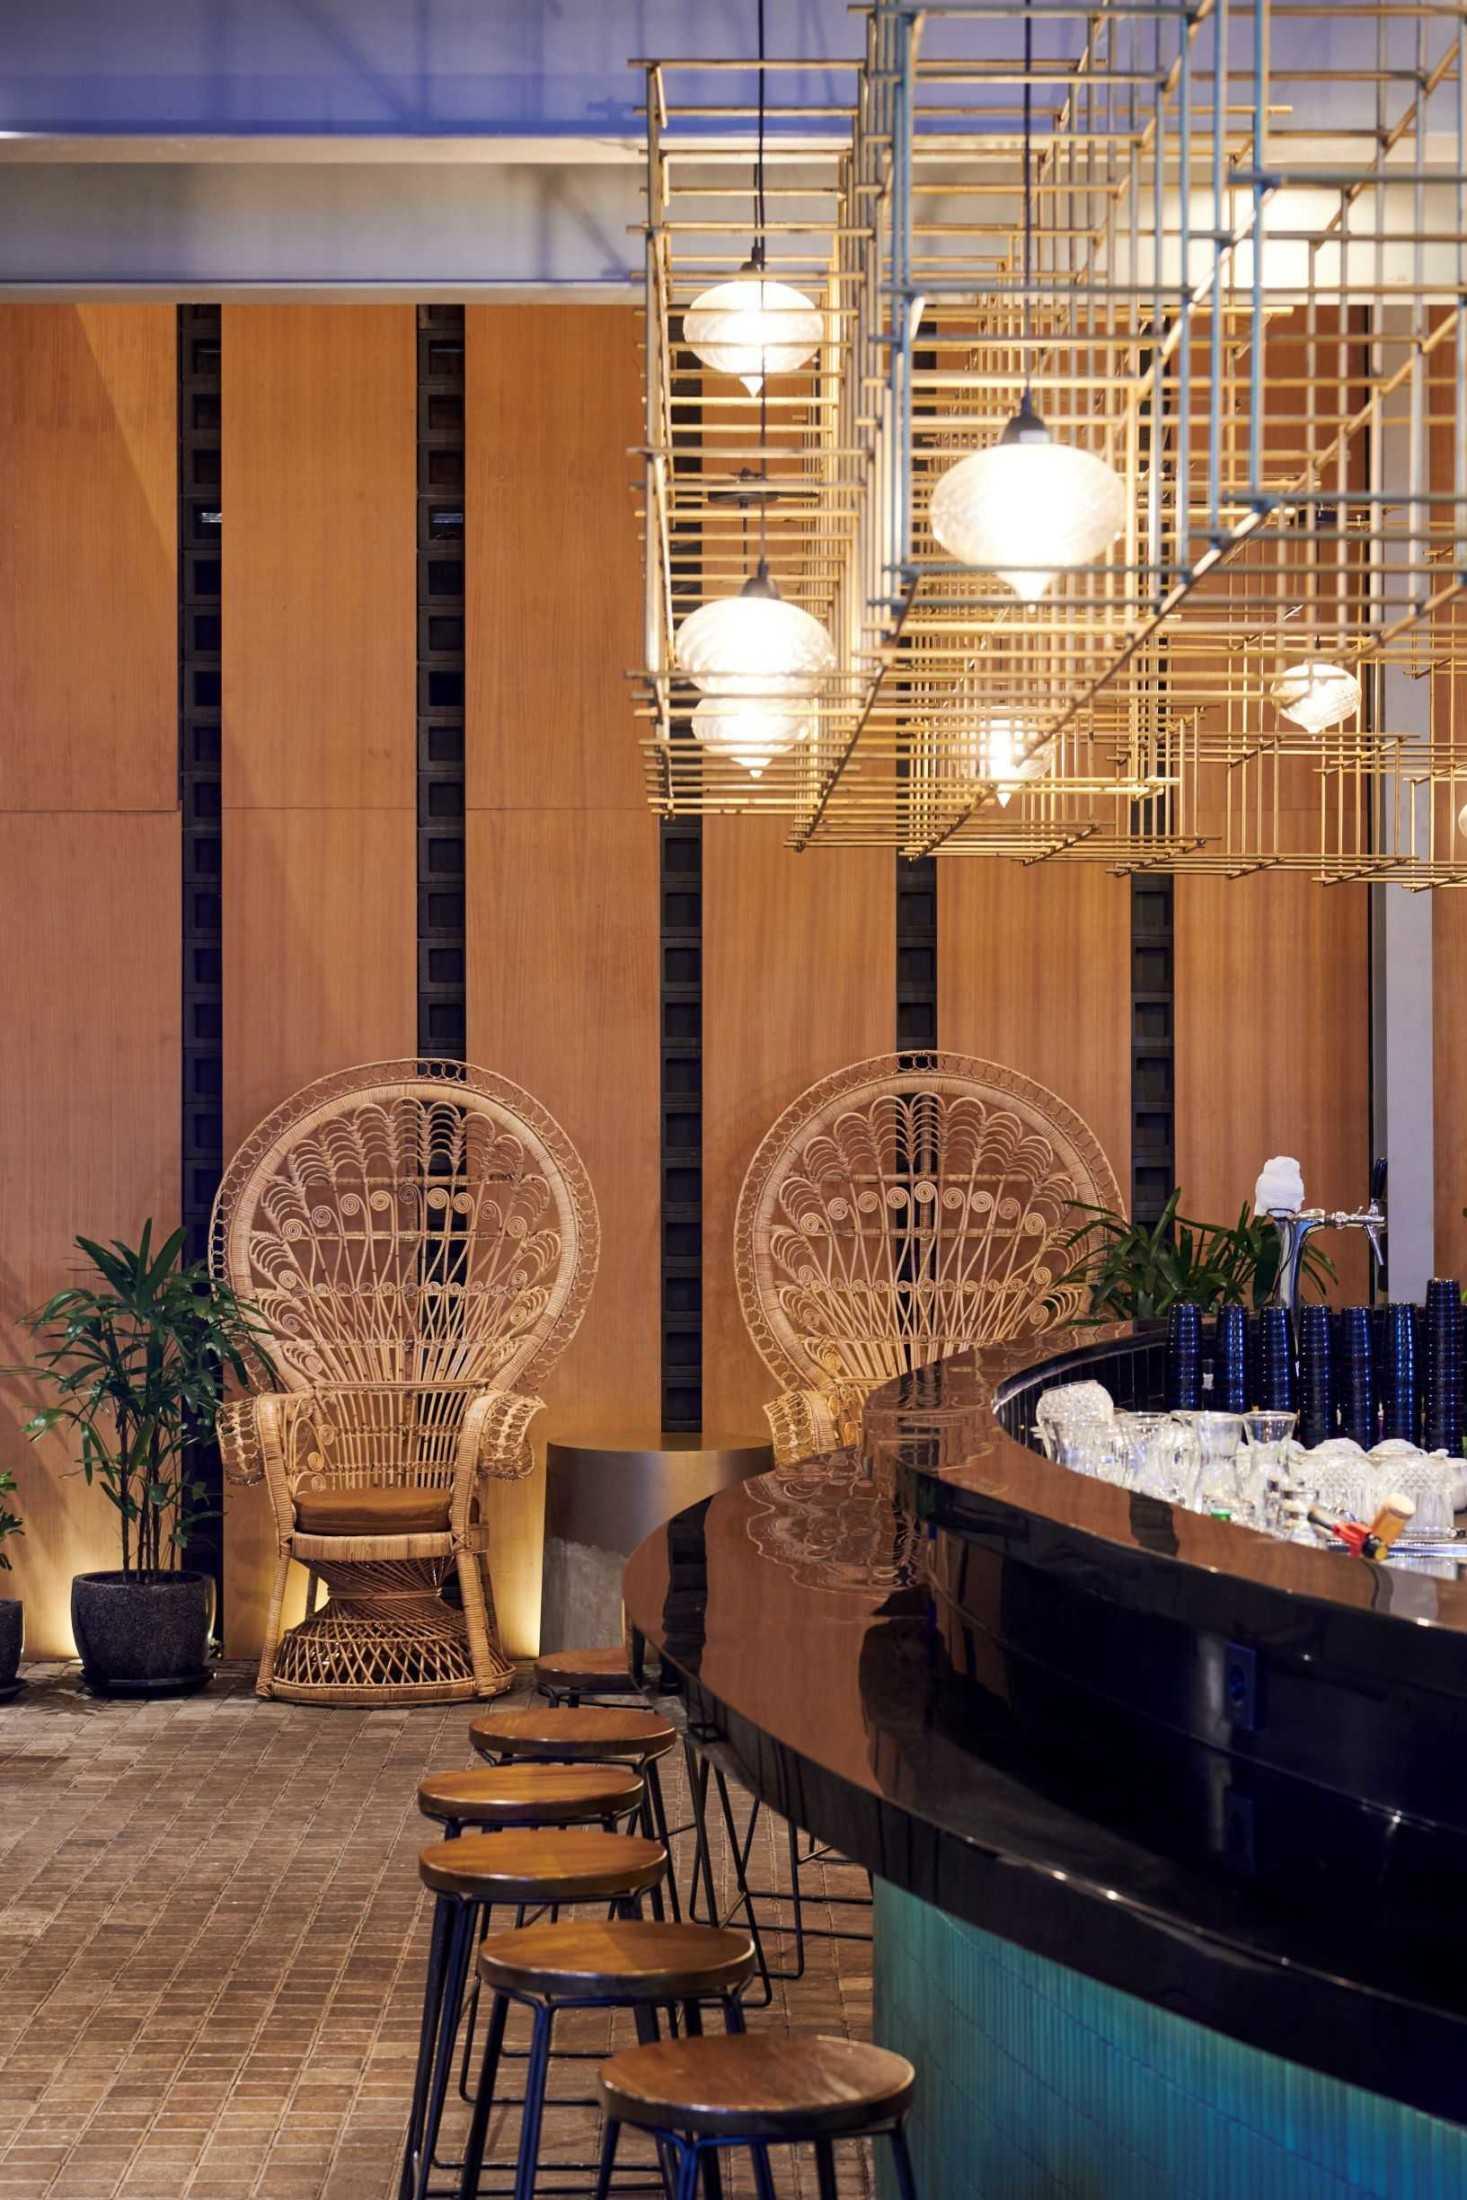 Hadivincent Architects Oval Bar Ciumbuleuit, Cidadap, Kota Bandung, Jawa Barat, Indonesia Ciumbuleuit, Cidadap, Kota Bandung, Jawa Barat, Indonesia Hadivincent-Architects-Oval-Bar  71525